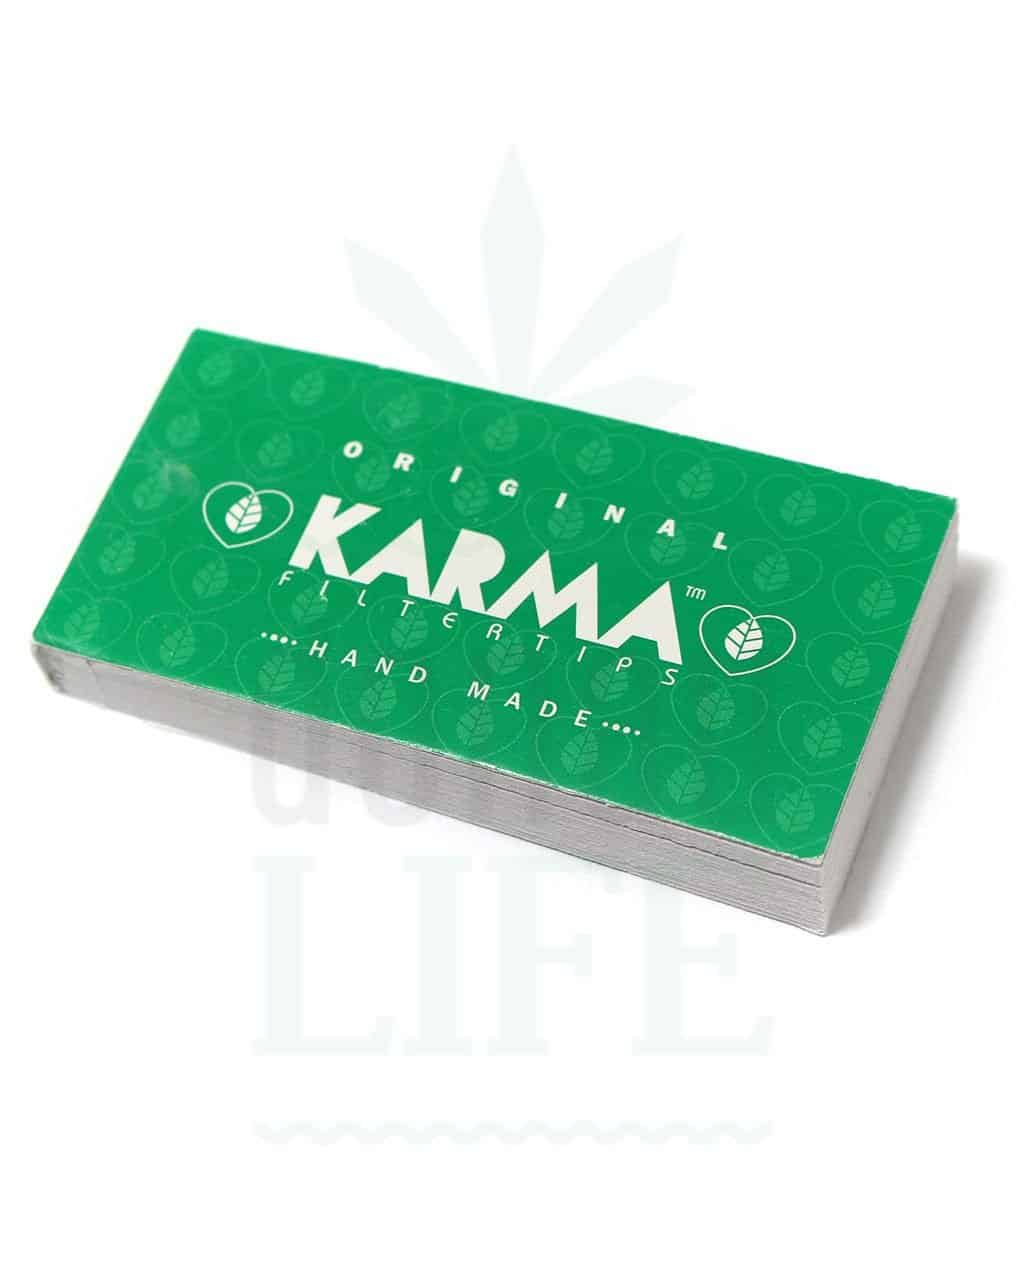 Beliebte Marken KARMA Filter Tips Original 'XL Edition' | 32 Blatt